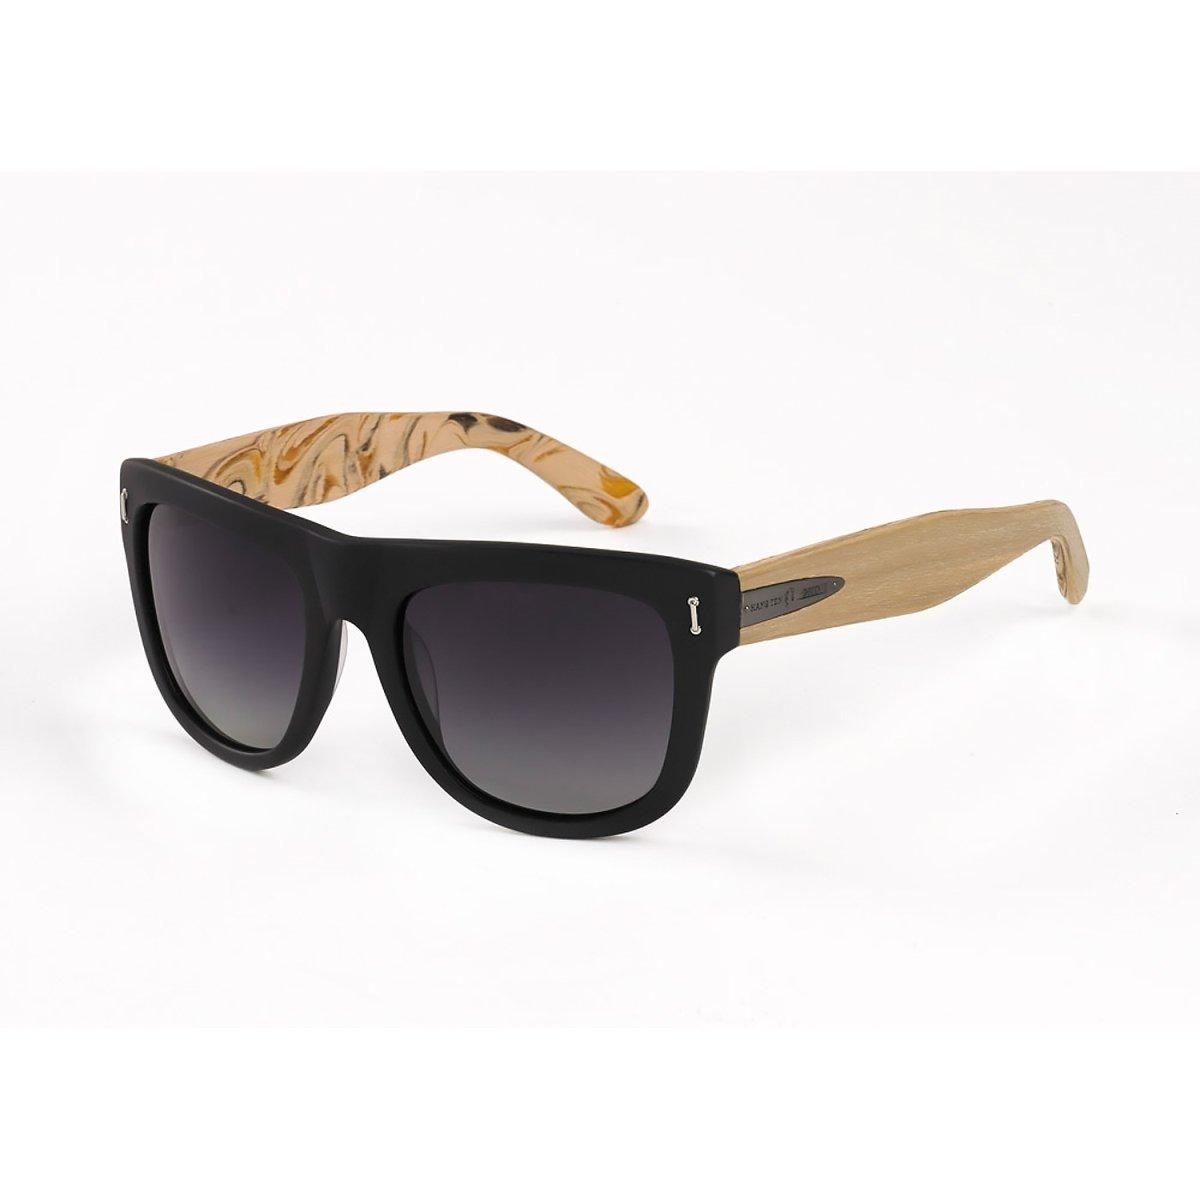 Hang Ten Gold Surf Woody-Matte Black Pine Wood/Green Lens